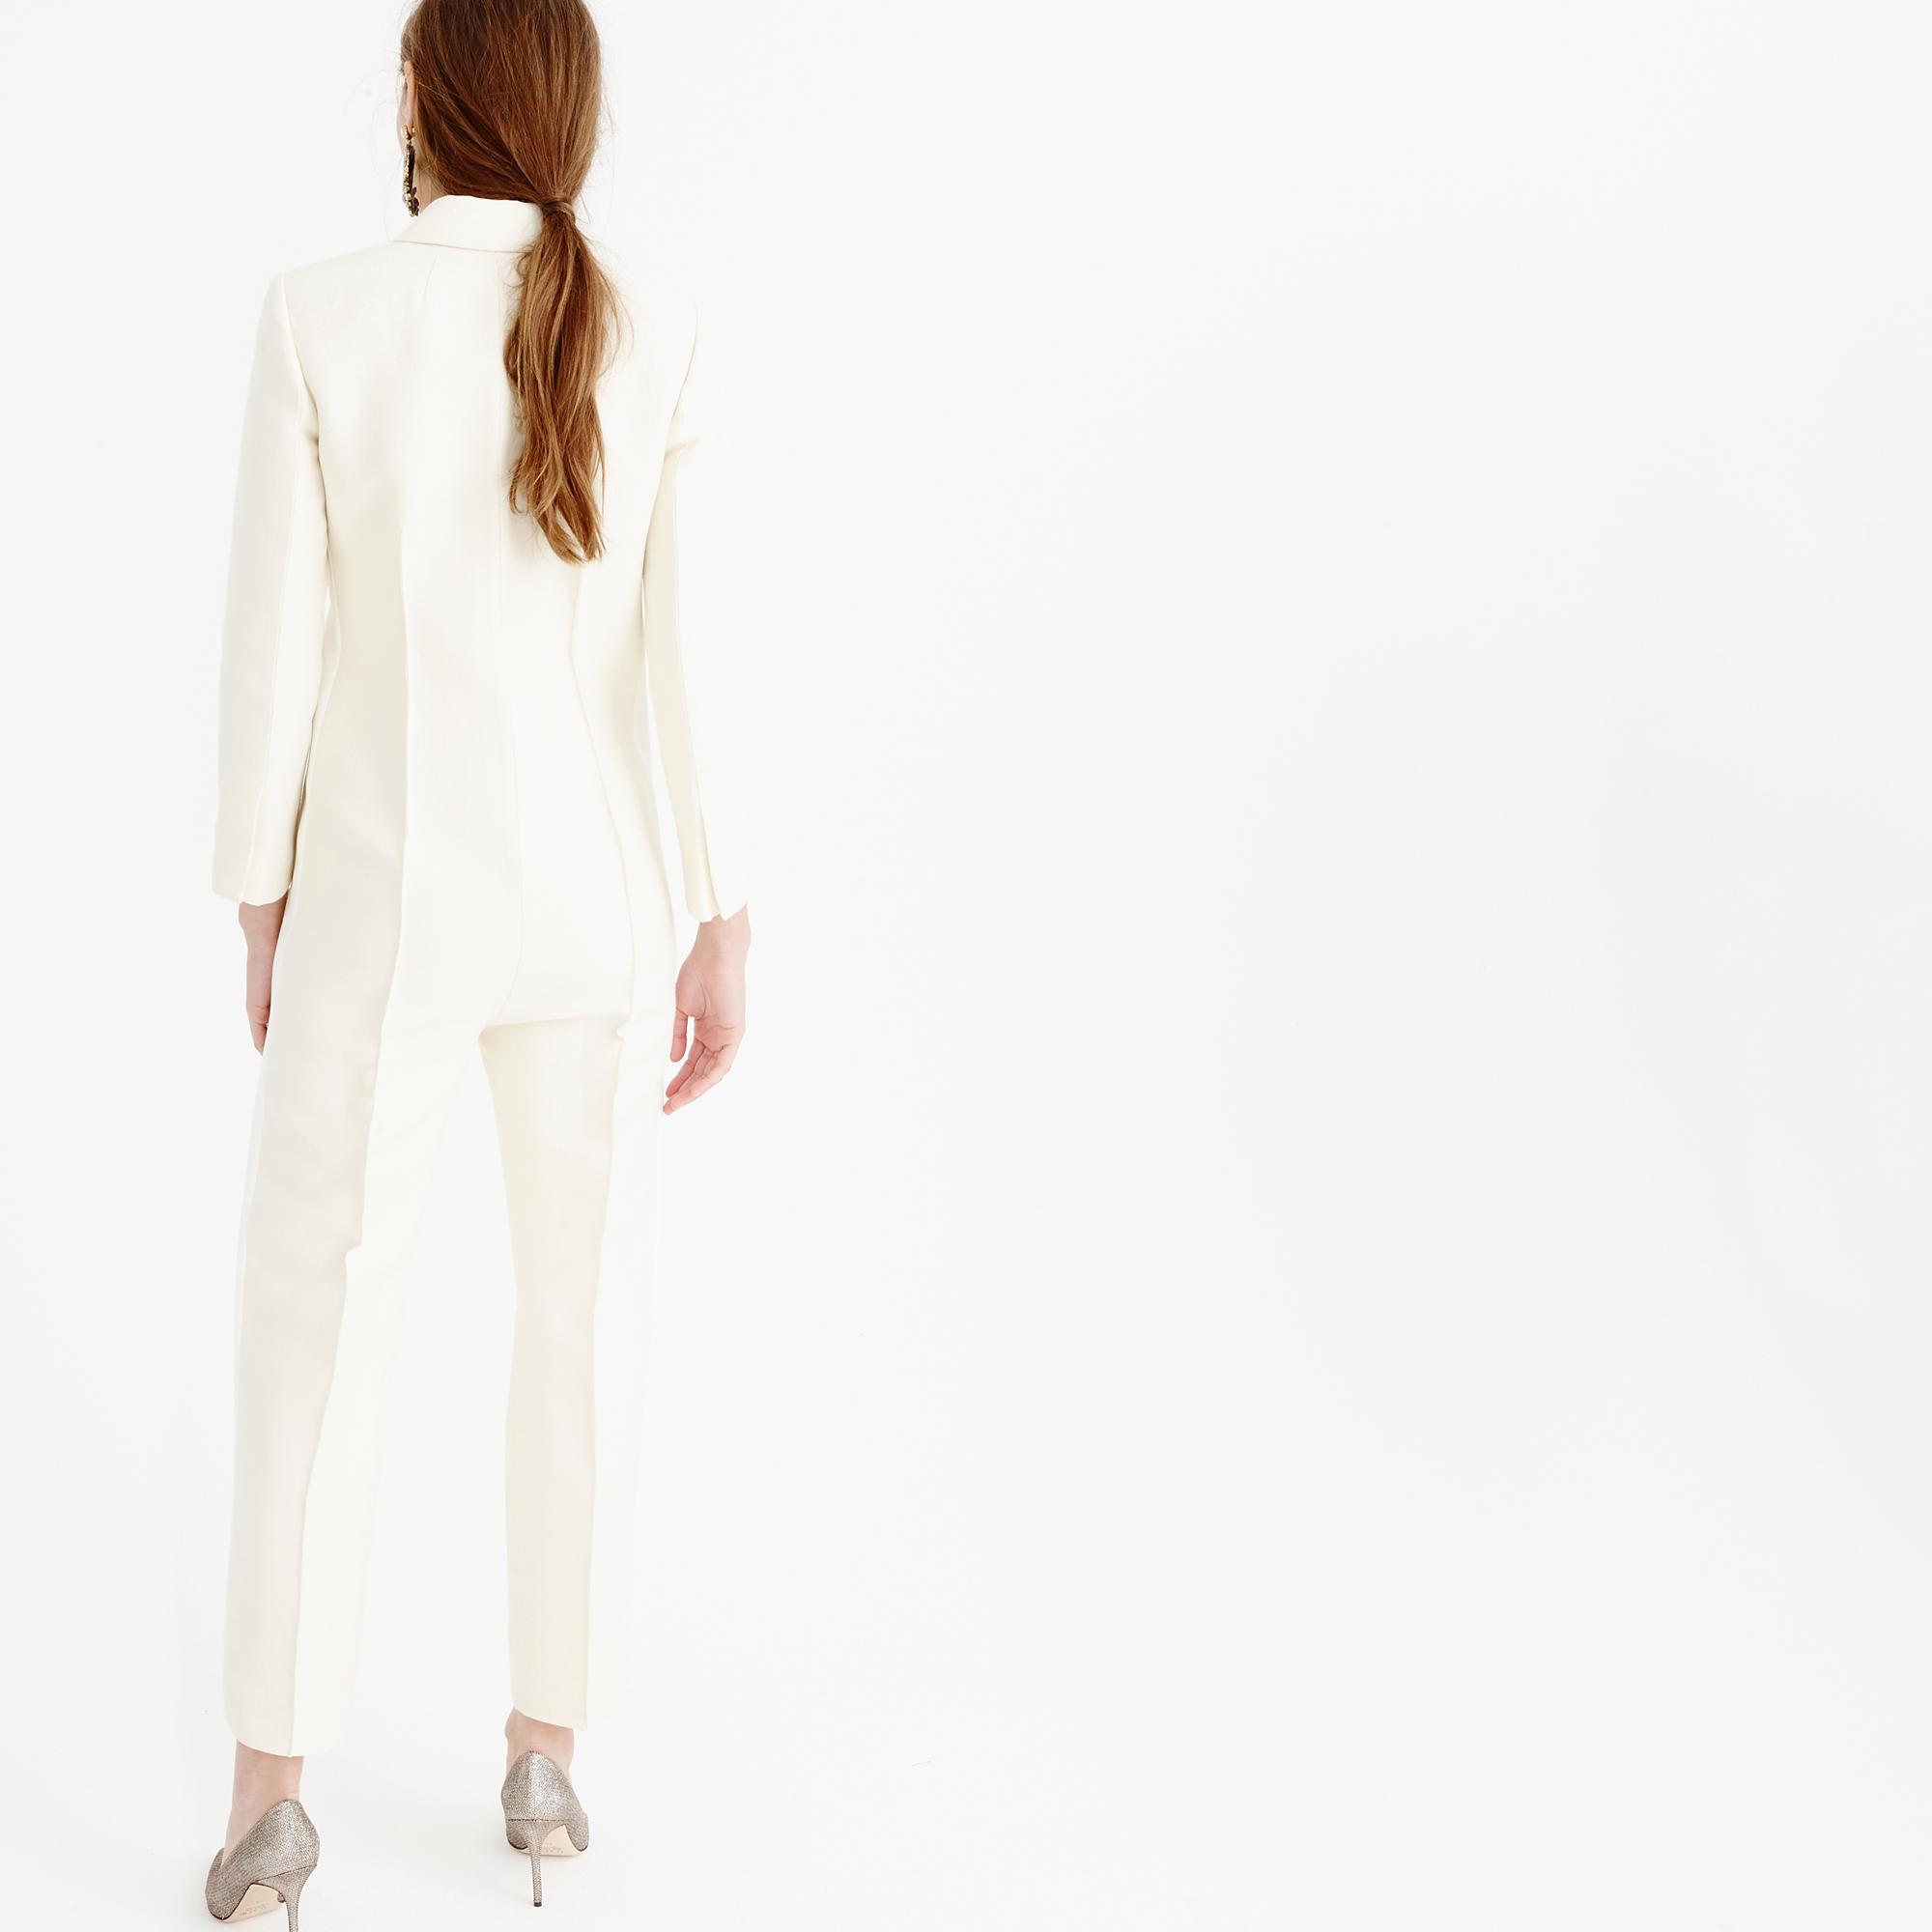 e53ccff3e6d Lyst - J.Crew Collection Tuxedo Jumpsuit in White